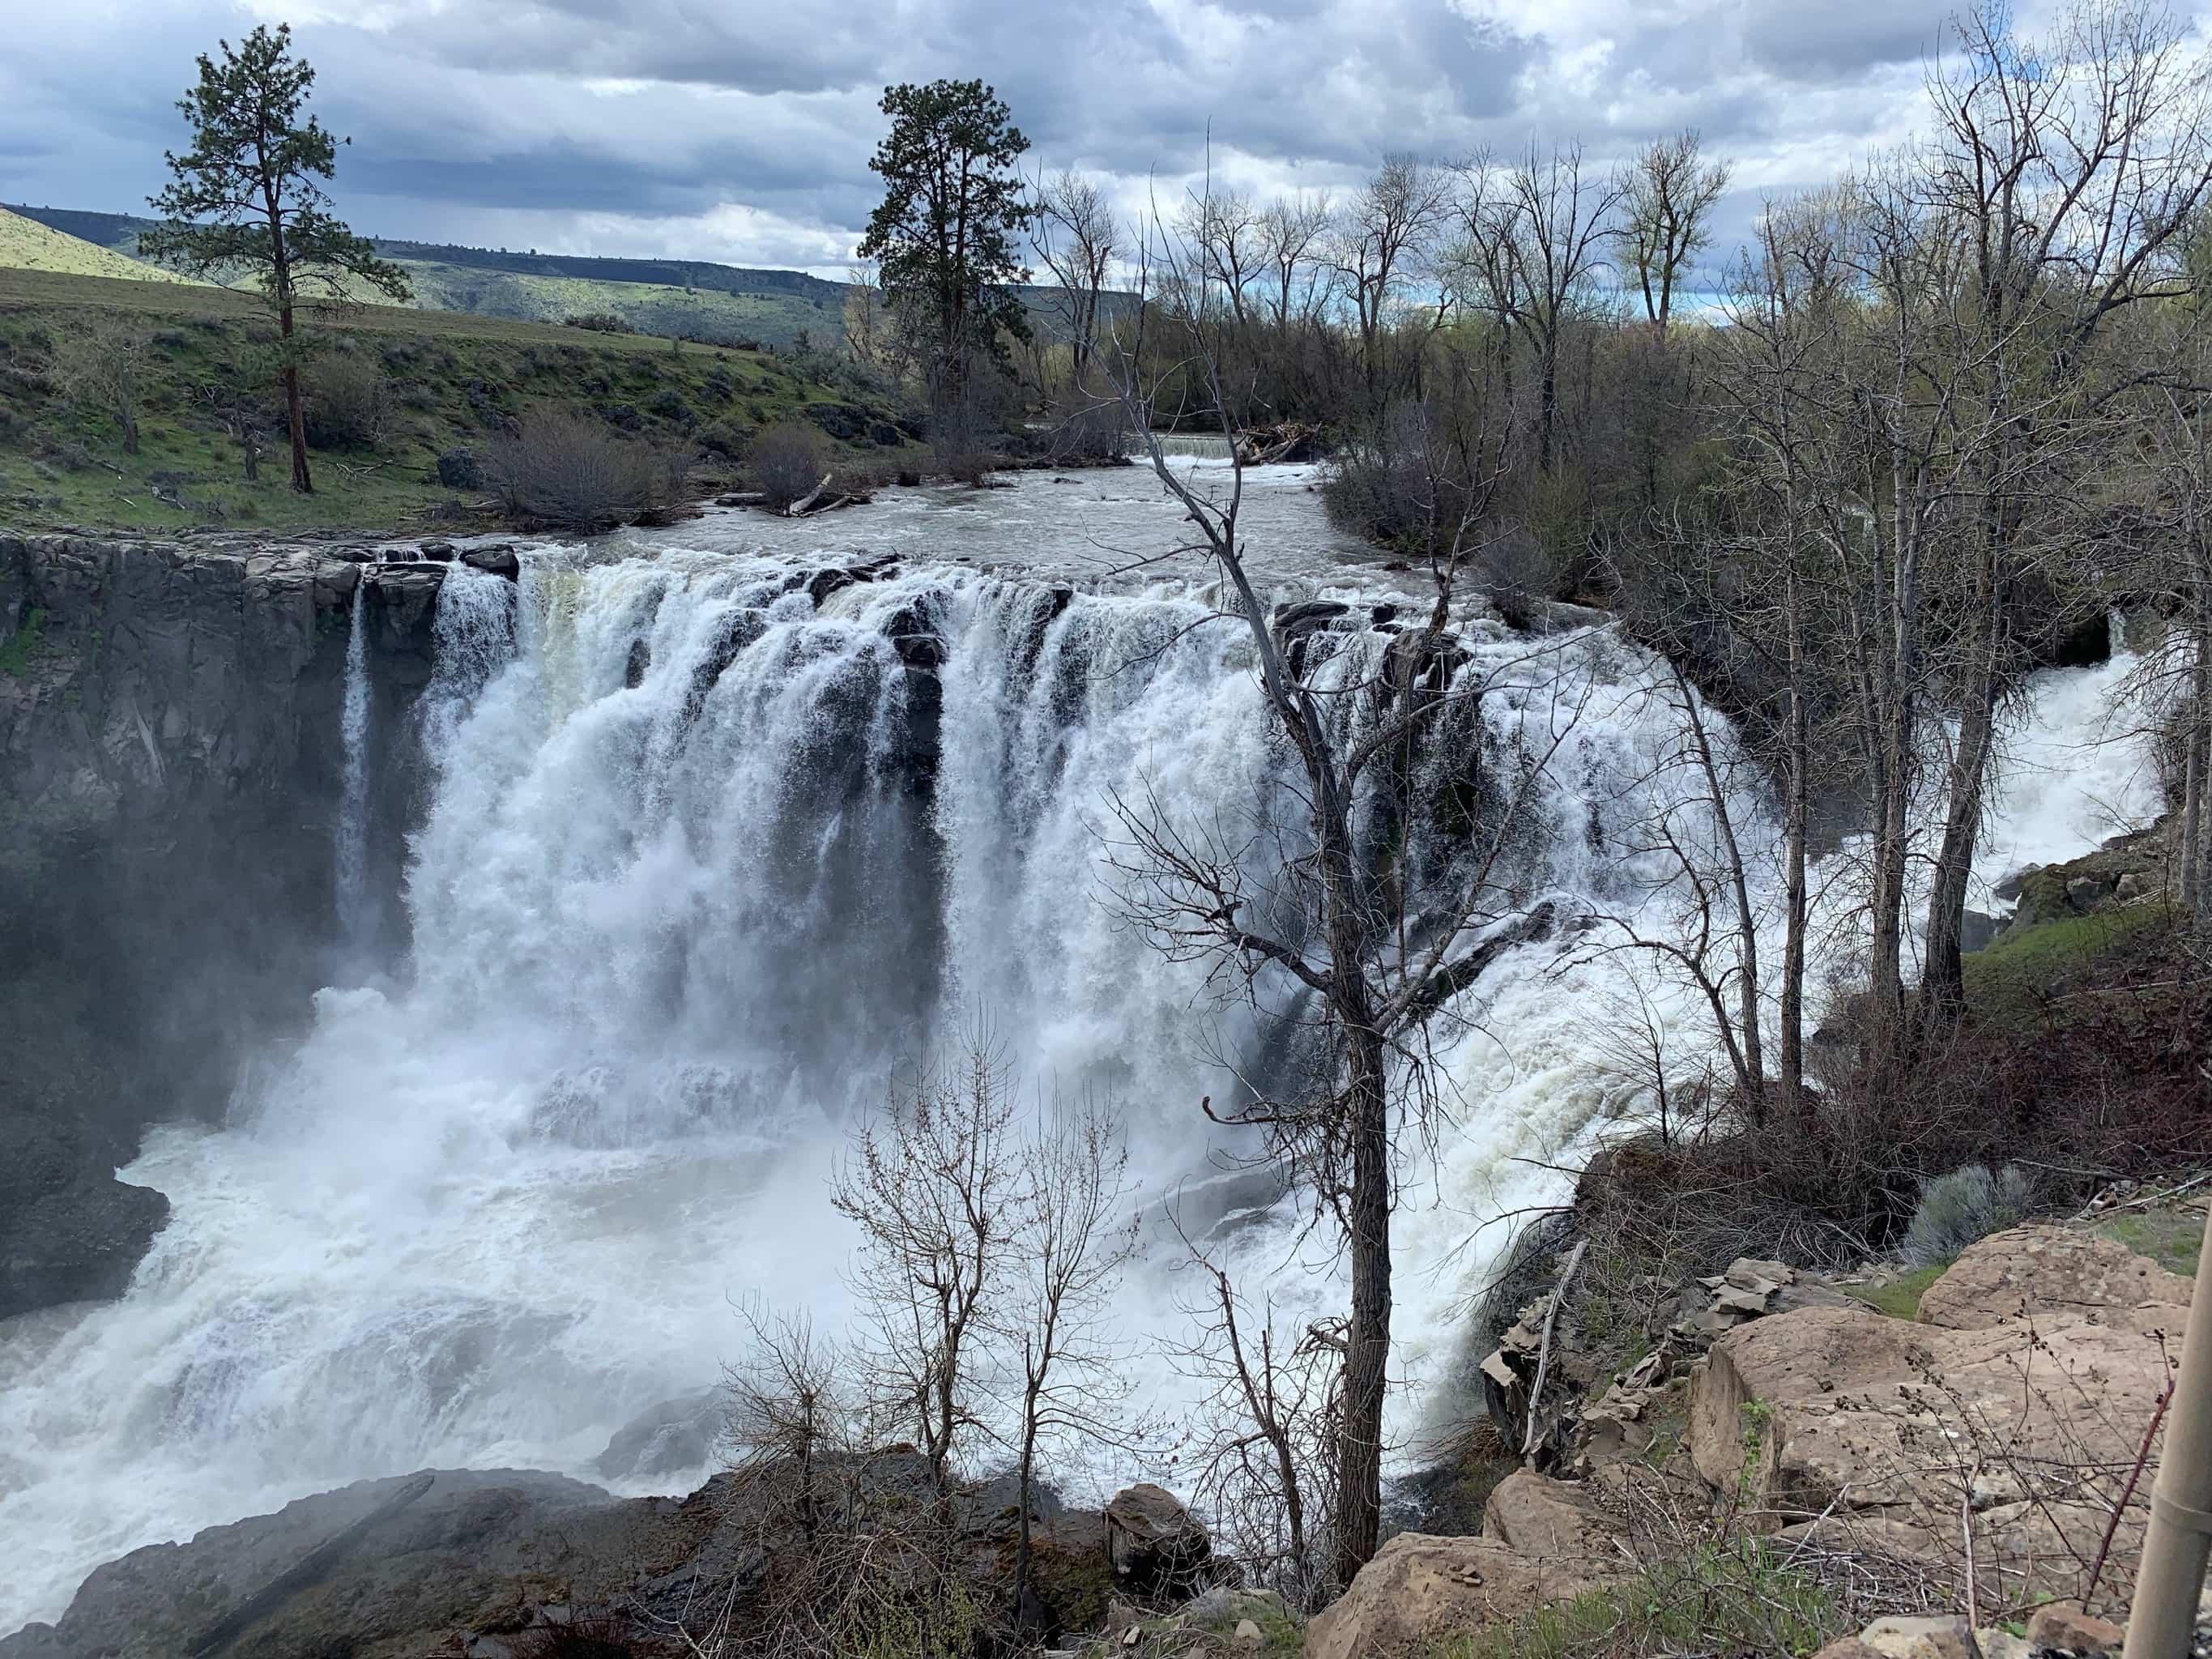 Bike rider on descent to Sherar's Falls.